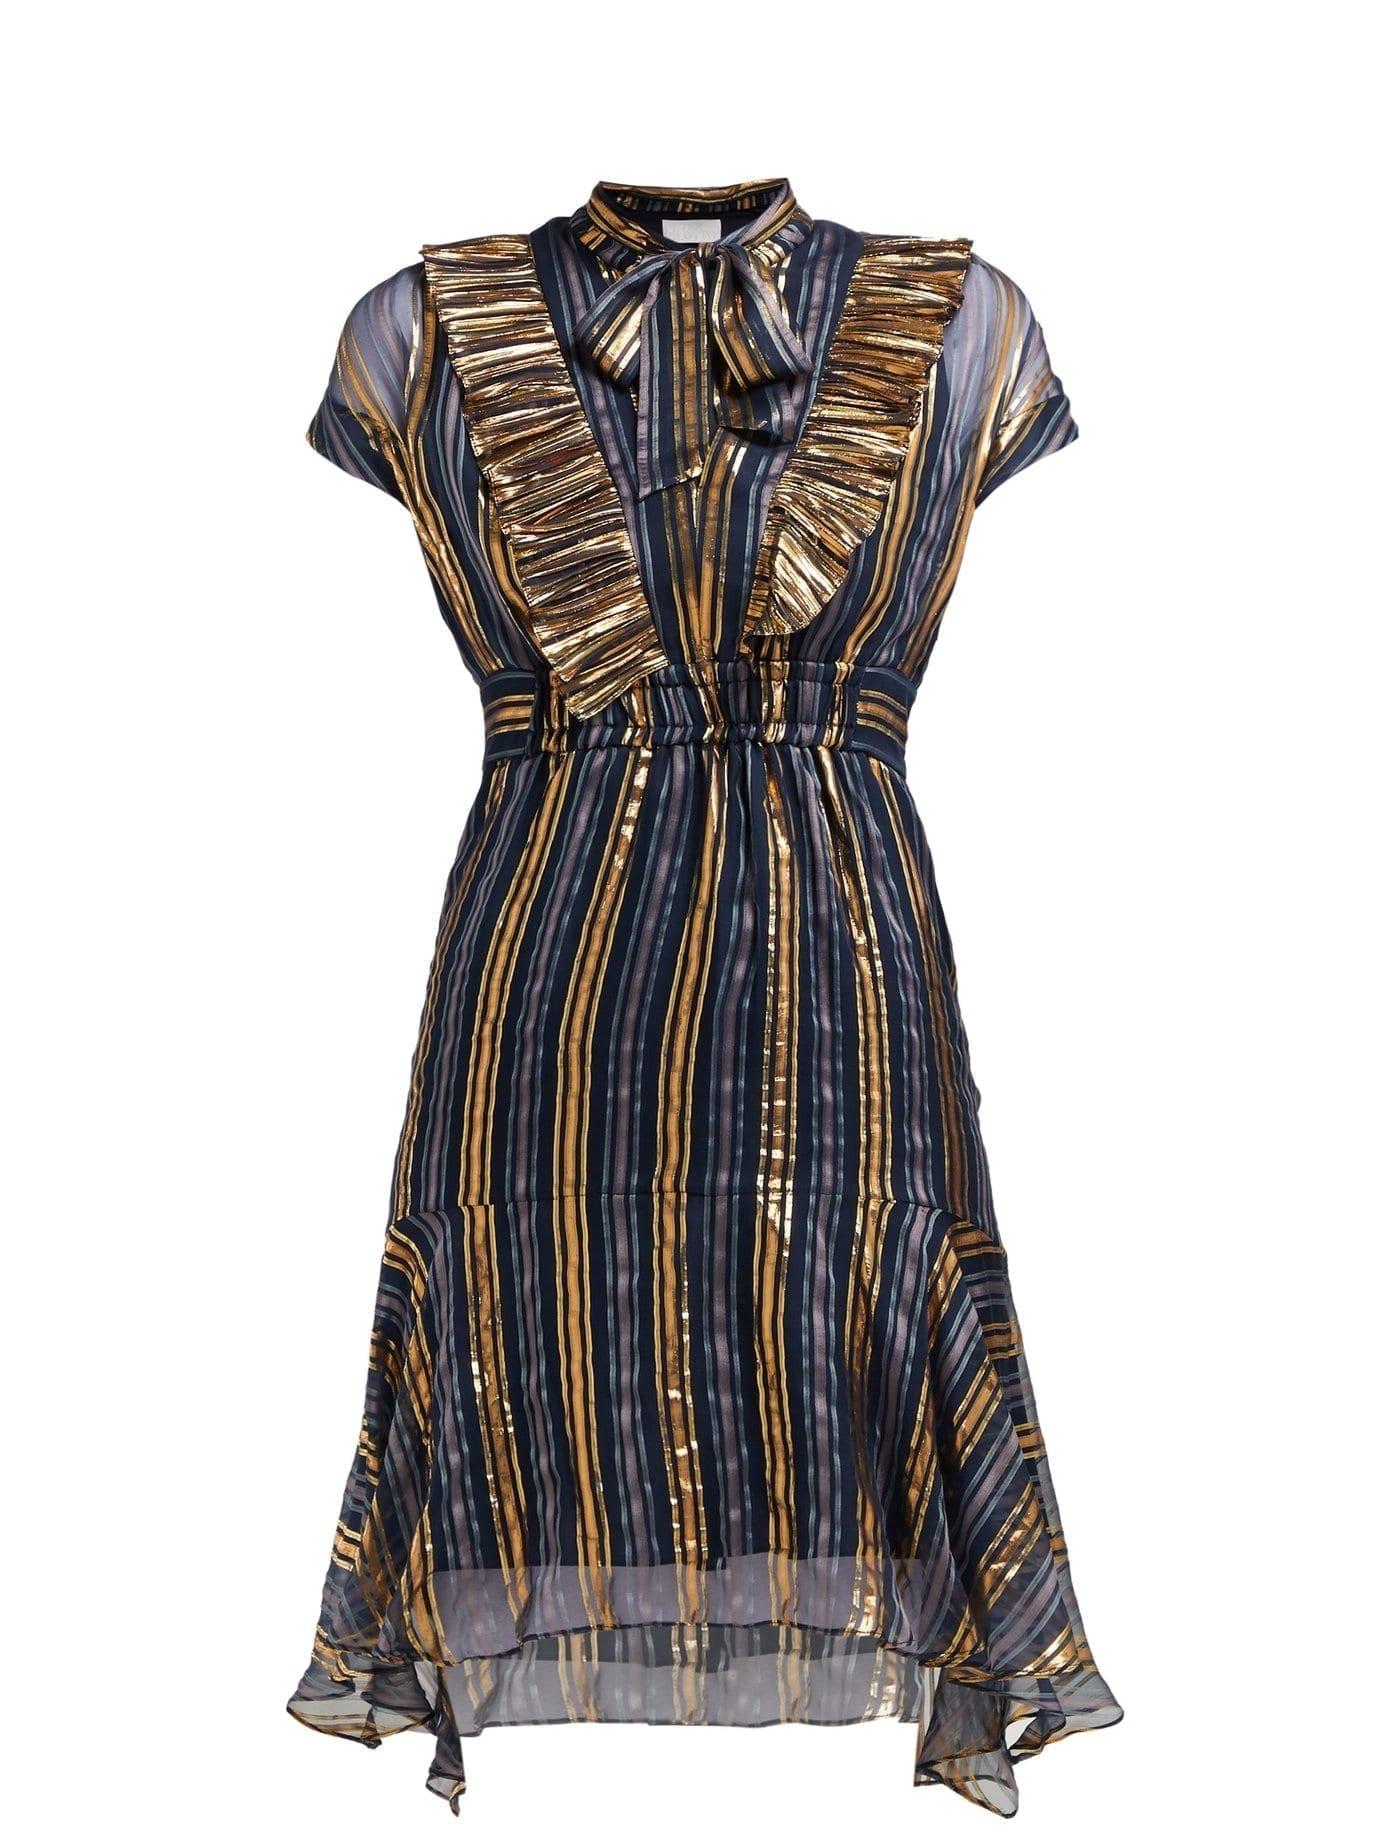 PETER PILOTTO Metallic Striped Silk-blend Chiffon Gold Dress